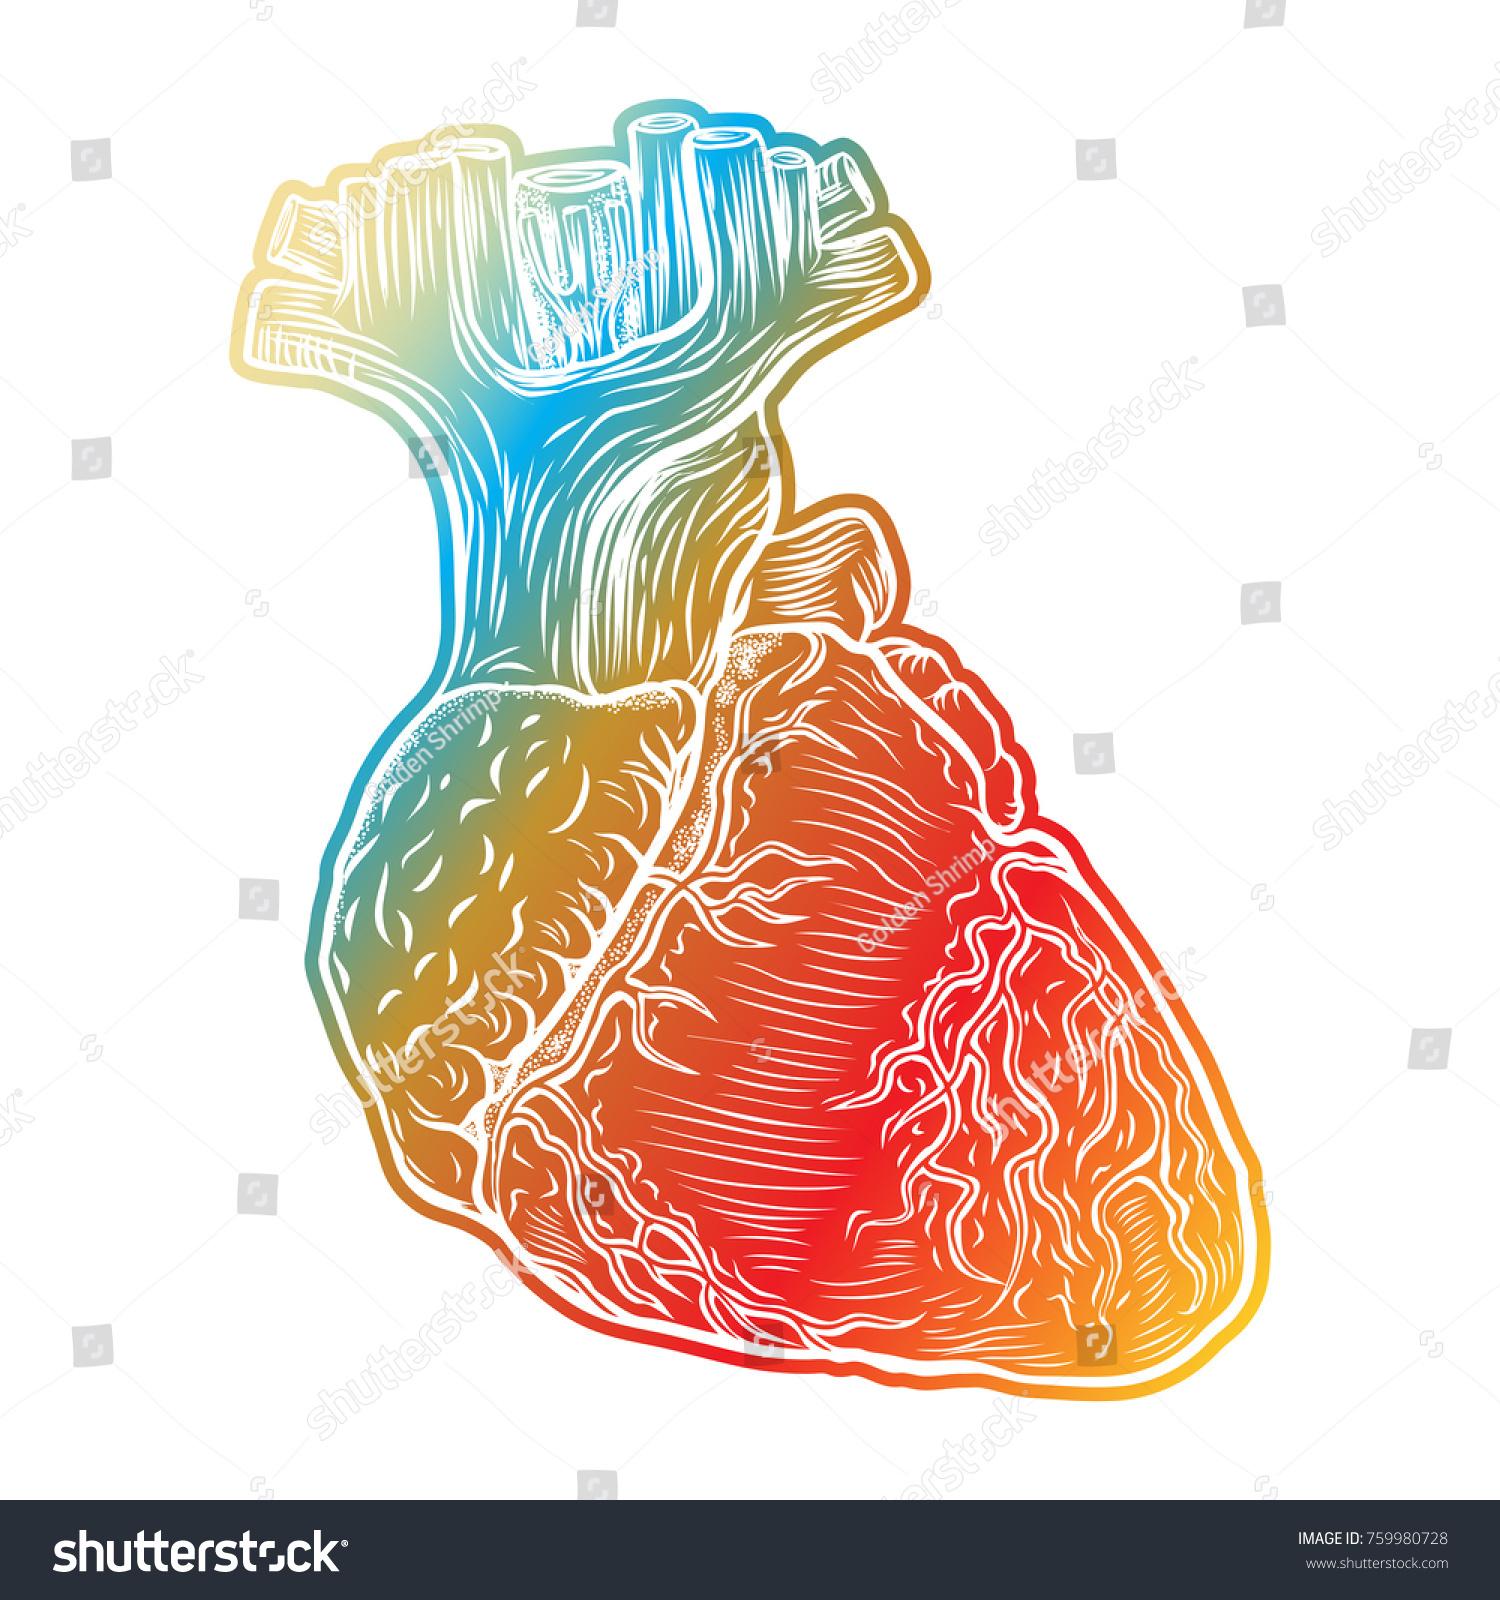 Red Human Heart Aorta Veins Arteries Stock Vector (Royalty Free ...